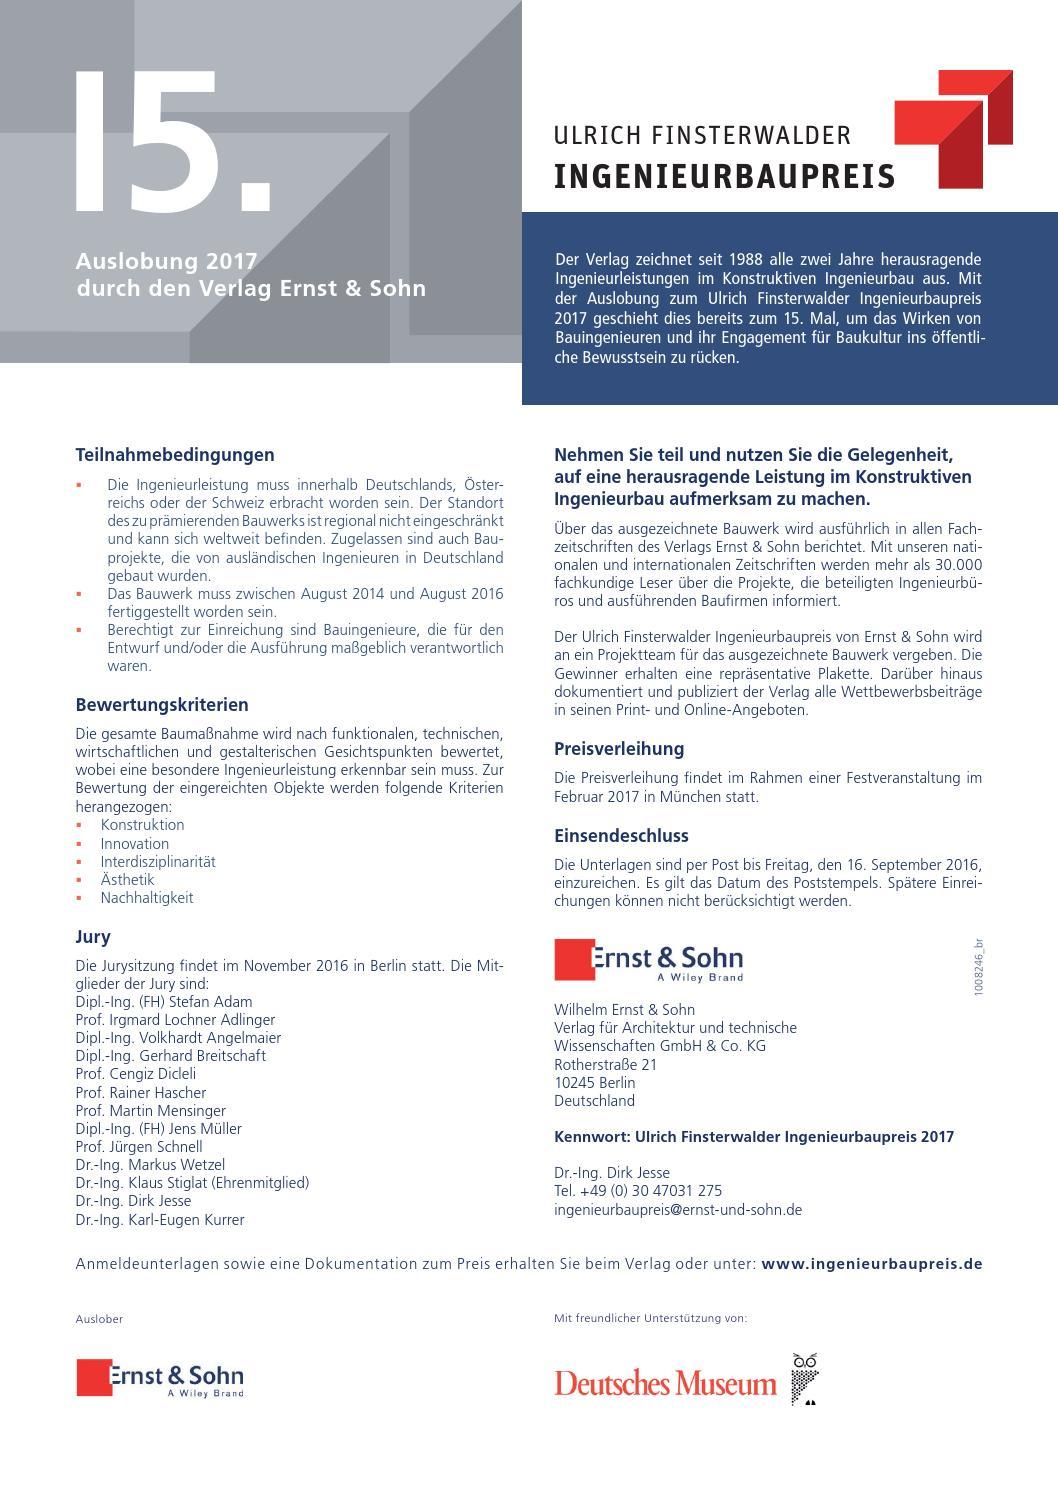 geotechnik 01/2016 free sample copy by Ernst & Sohn - issuu